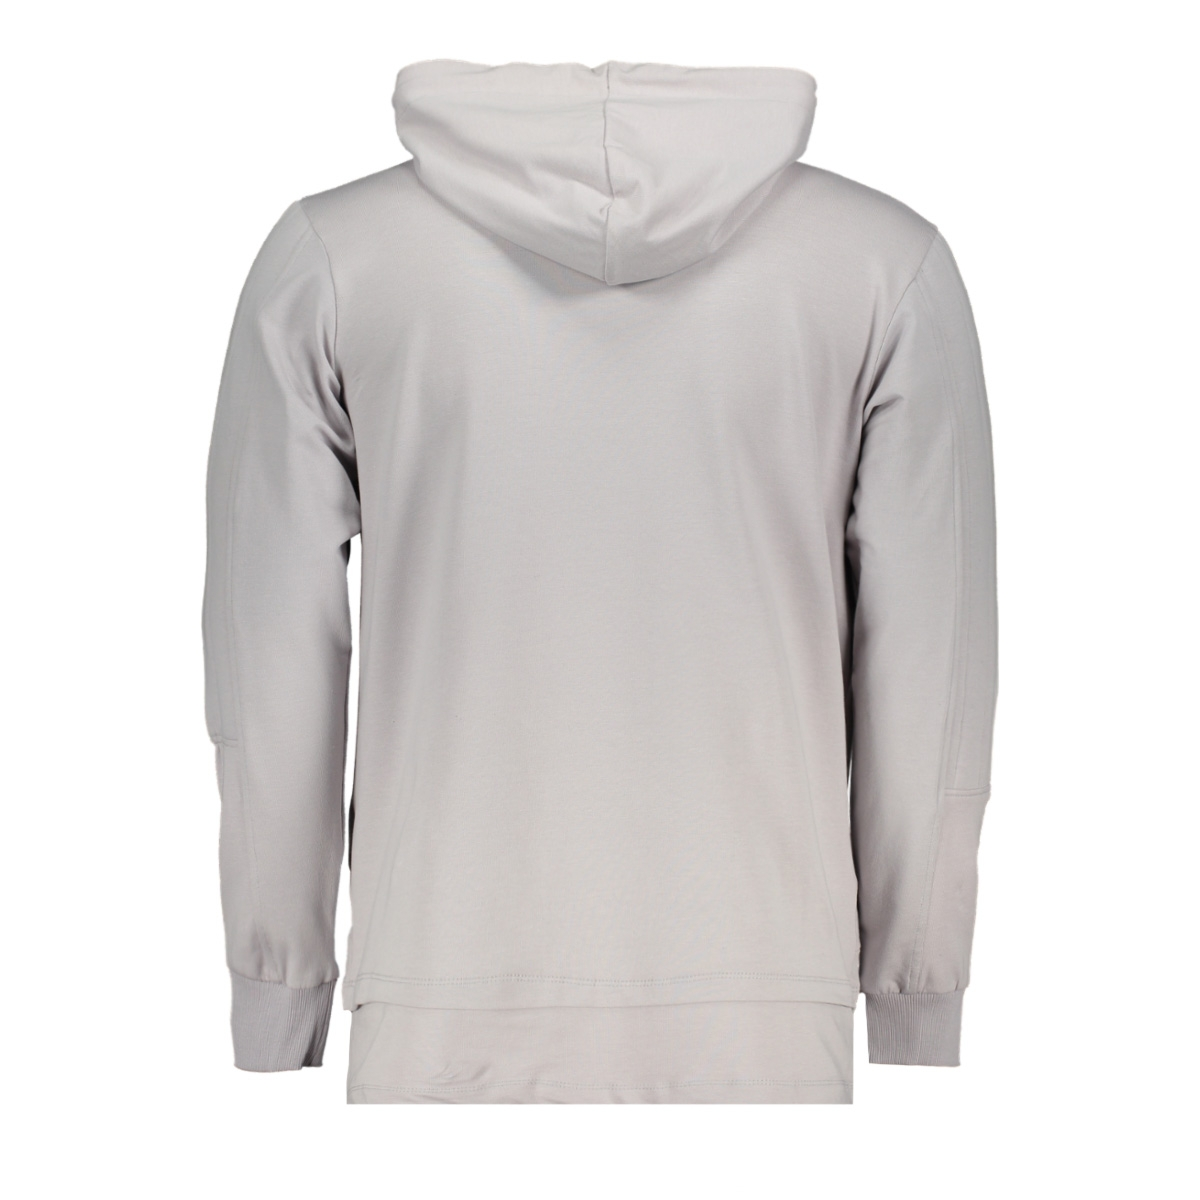 76124 gabbiano sweater grey